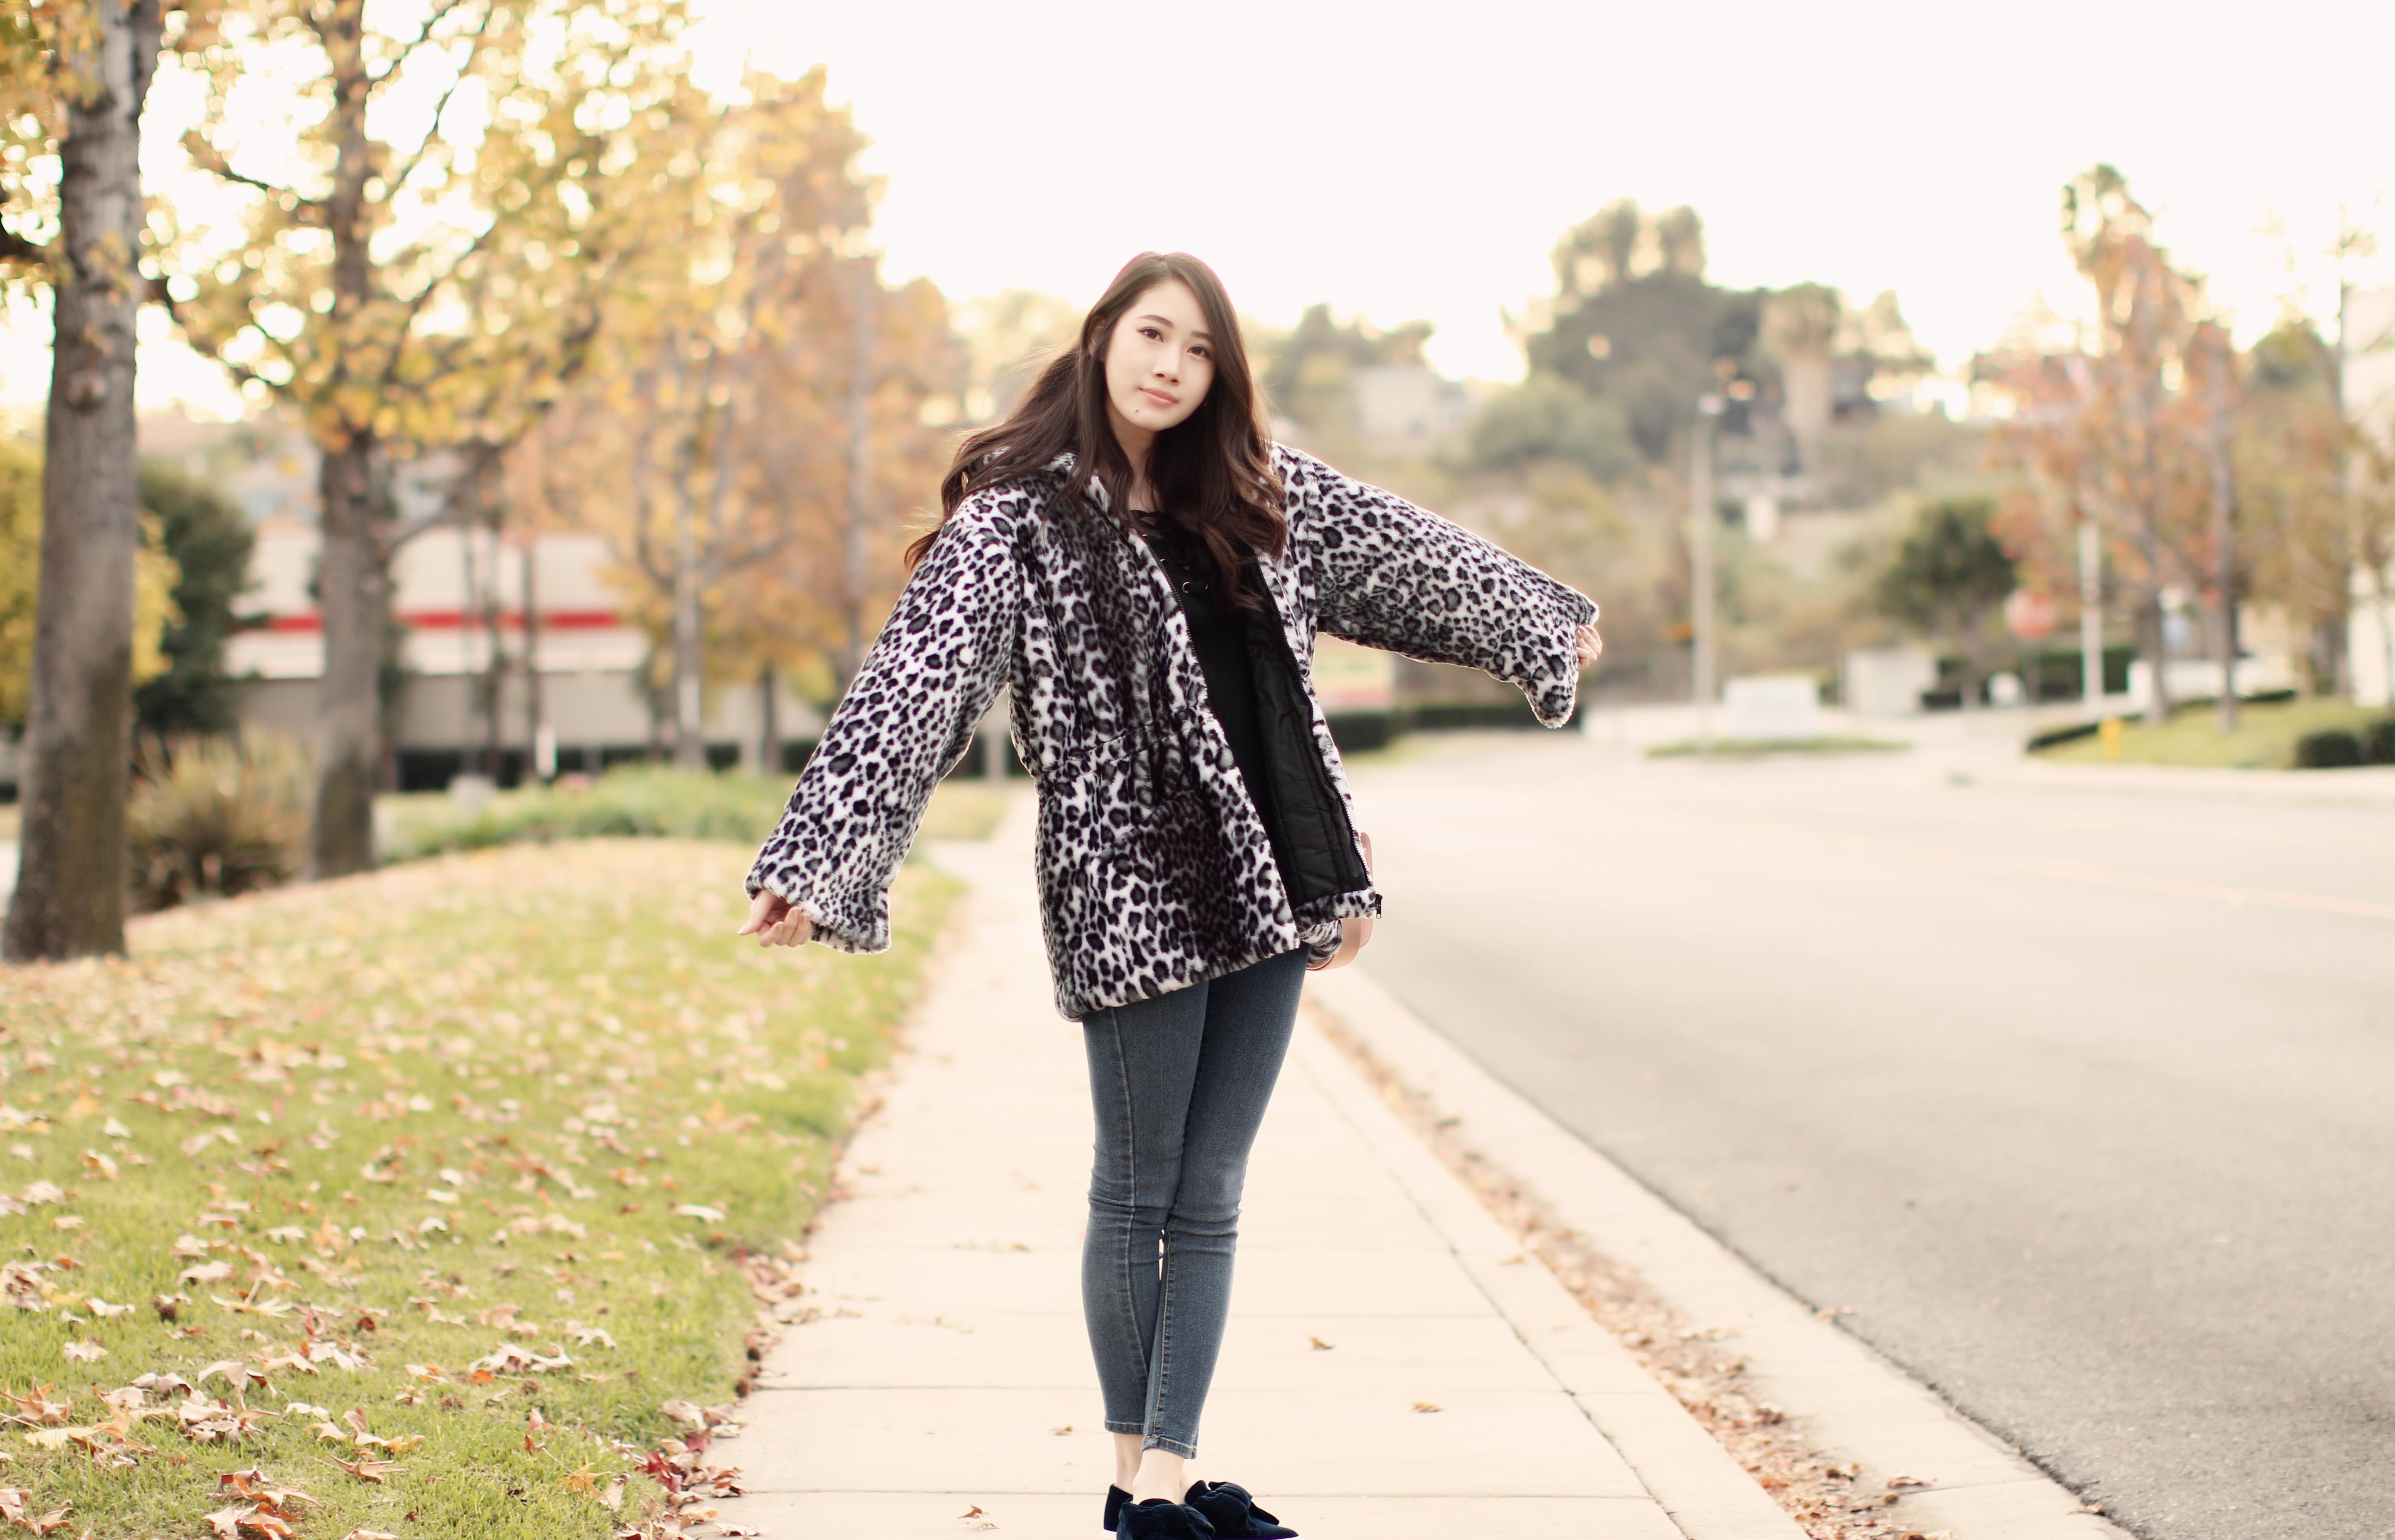 4054-ootd-fashion-style-outfitoftheday-wiwt-streetstyle-furcoat-fauxfur-forever21-f21xme-hollister-hcostylescene-elizabeeetht-clothestoyouuu